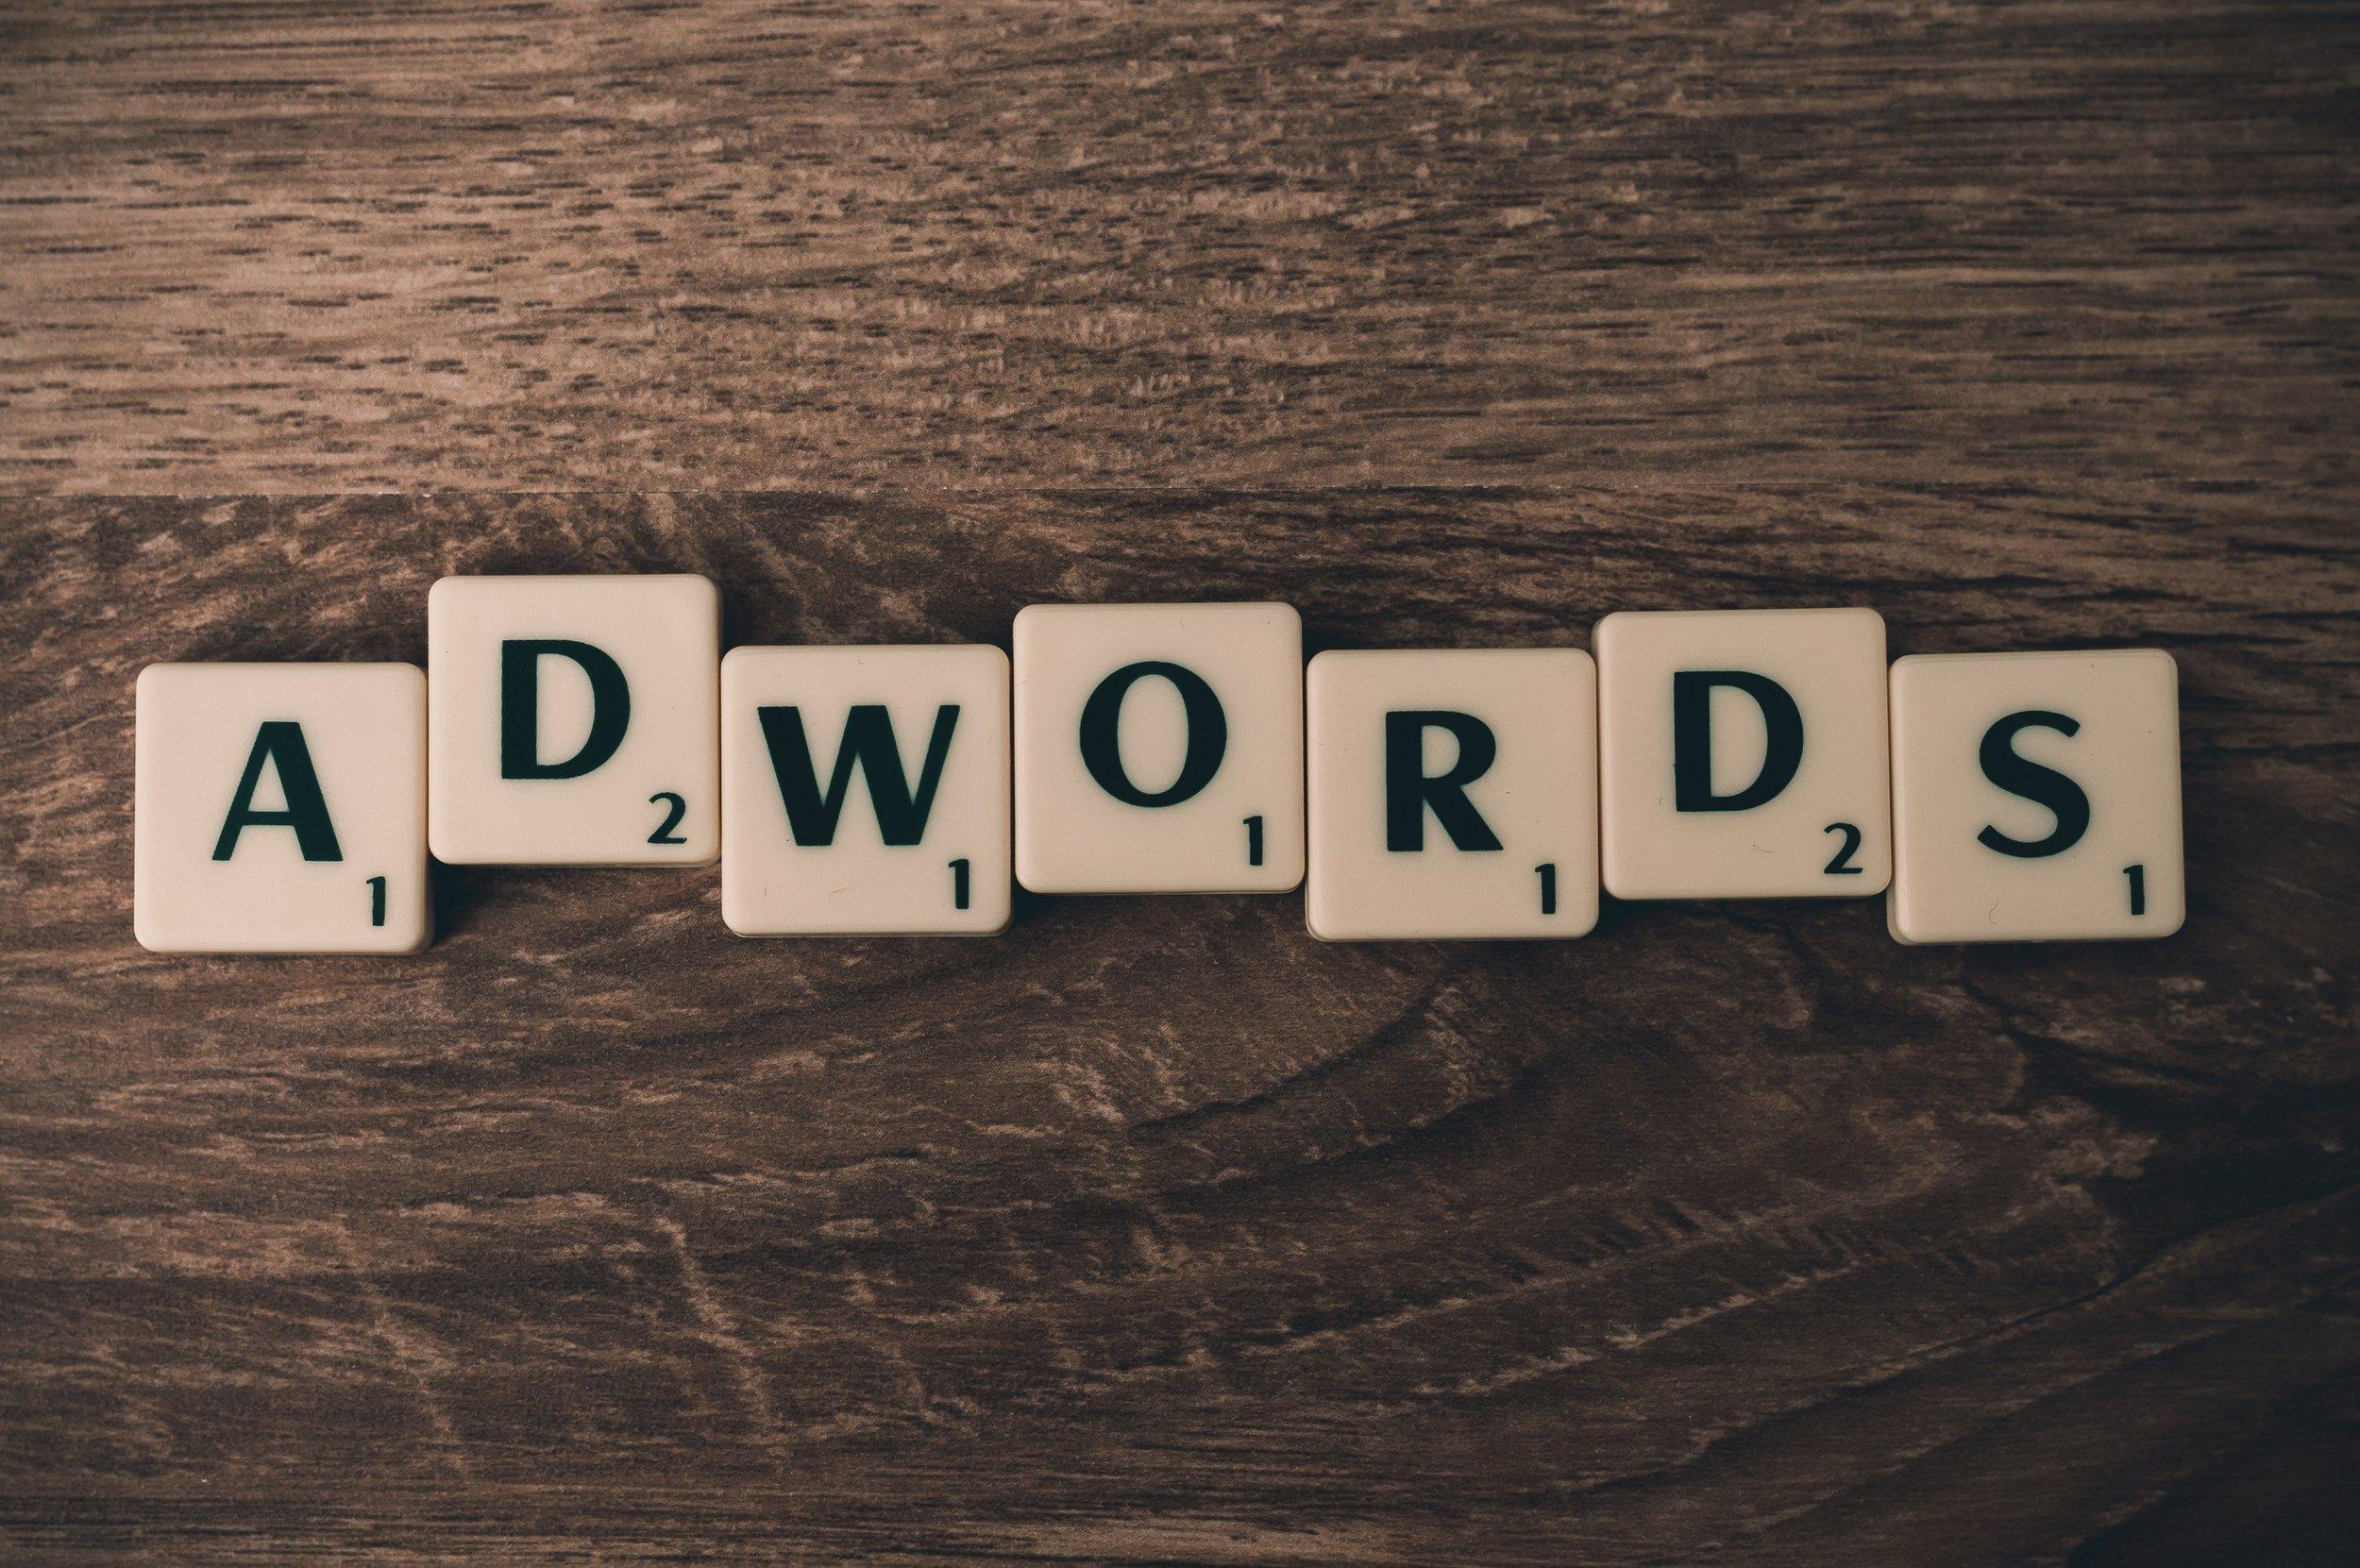 ads-adwords-alphabet-267401.jpg